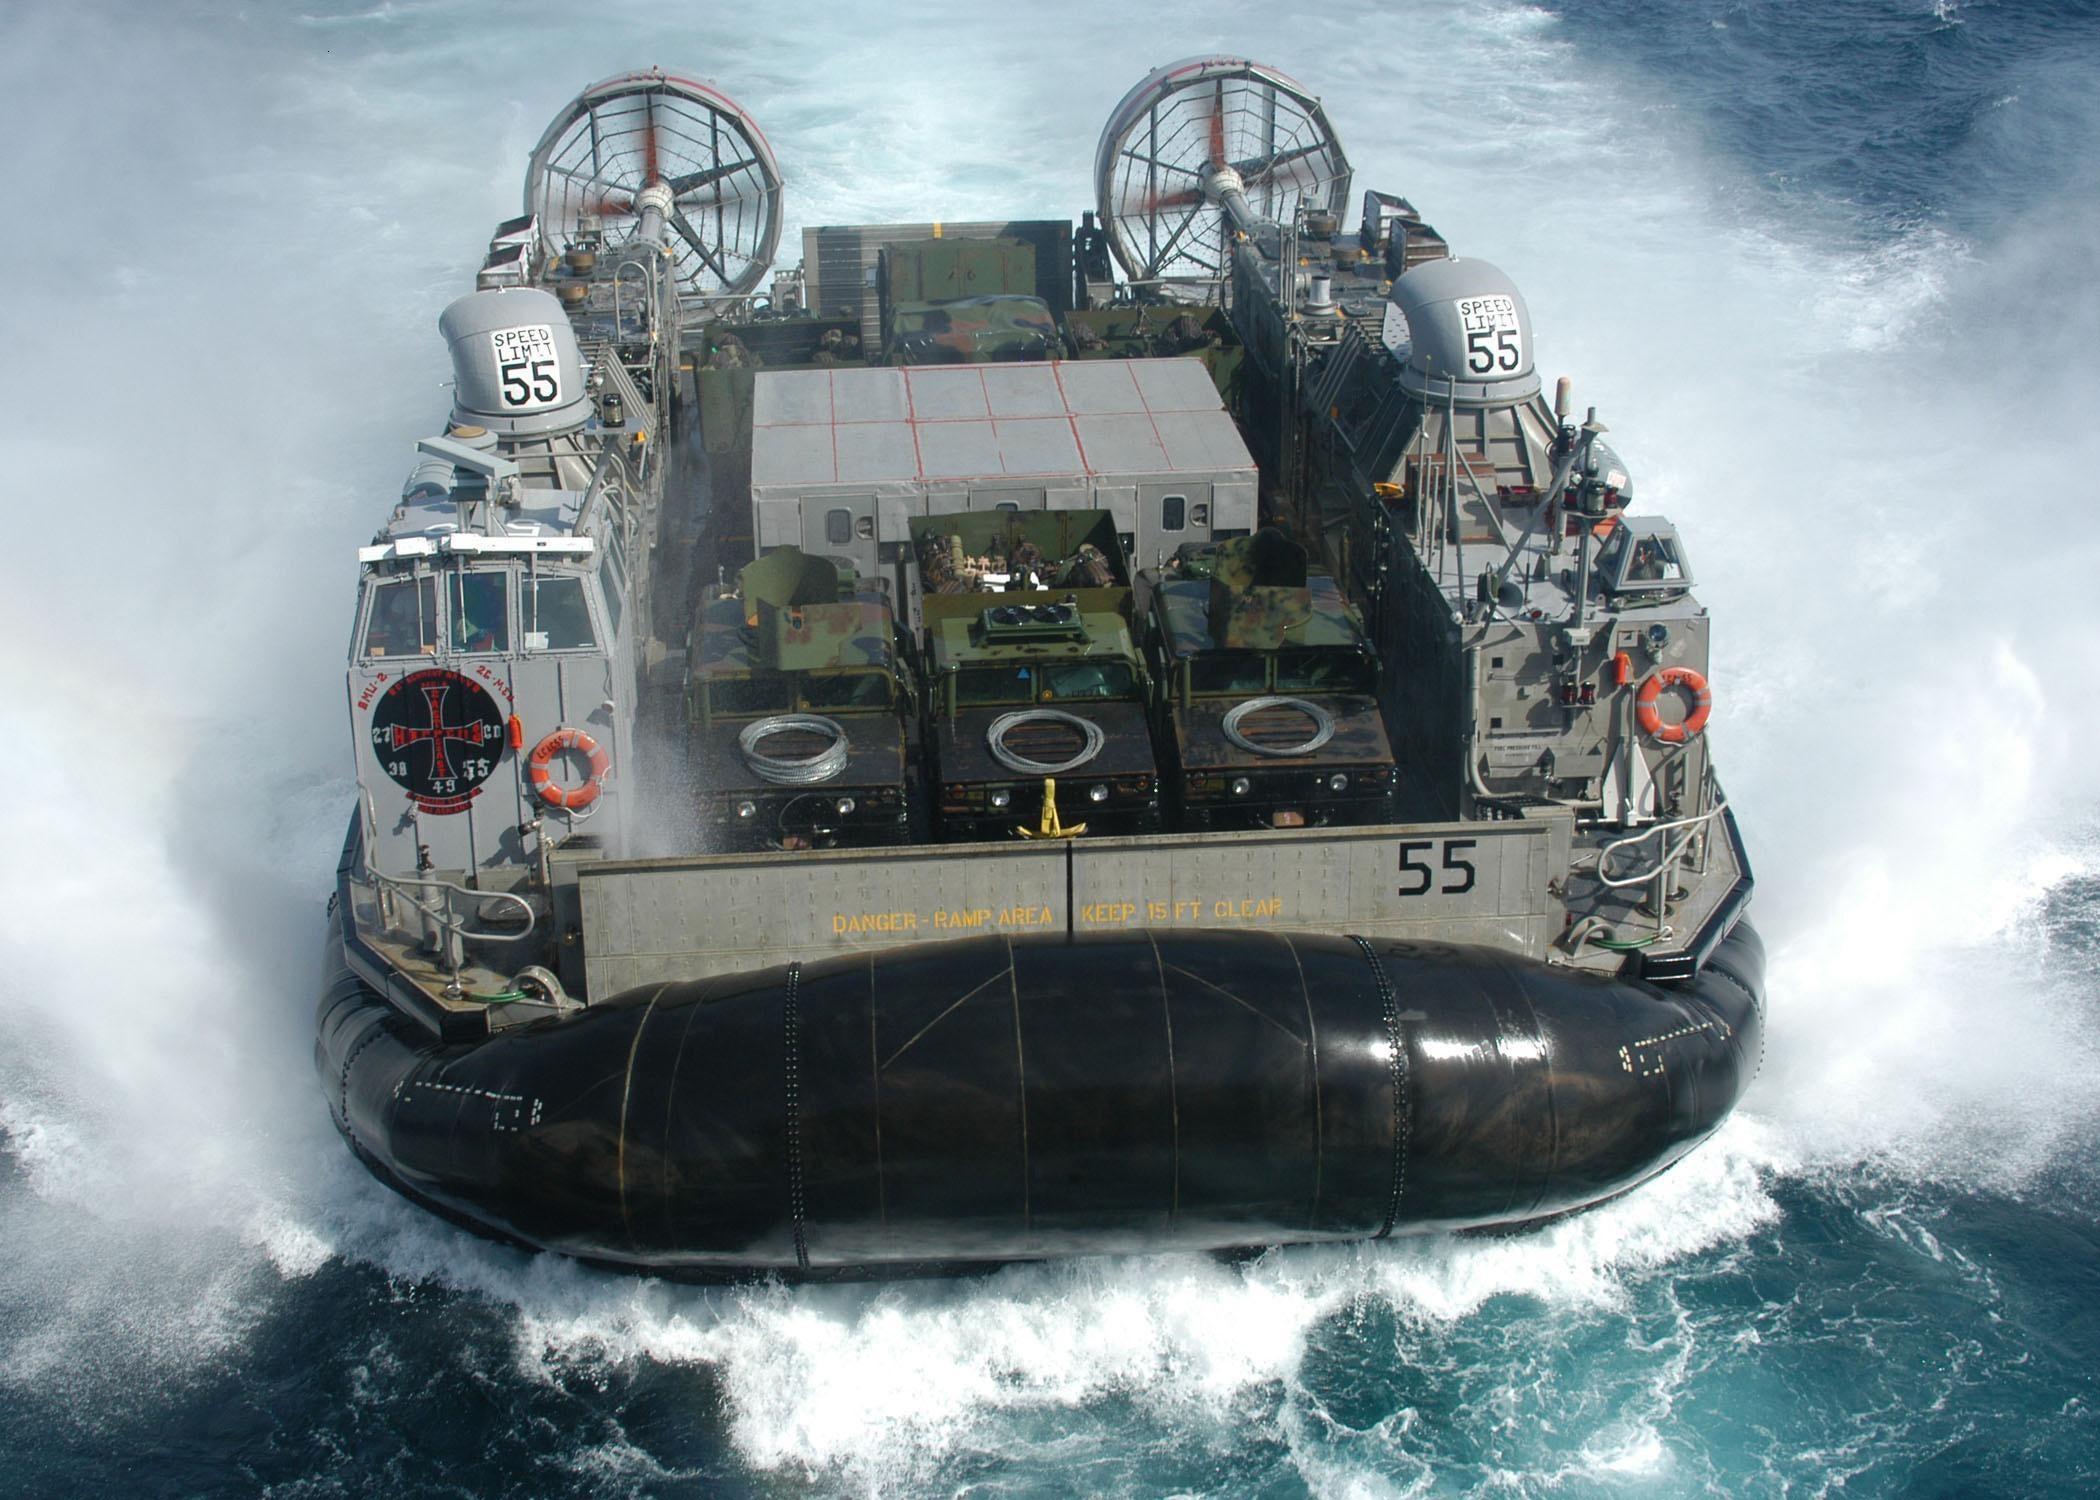 US Navy sailors inside an amphibious assault ship — or a lost Aliens scene